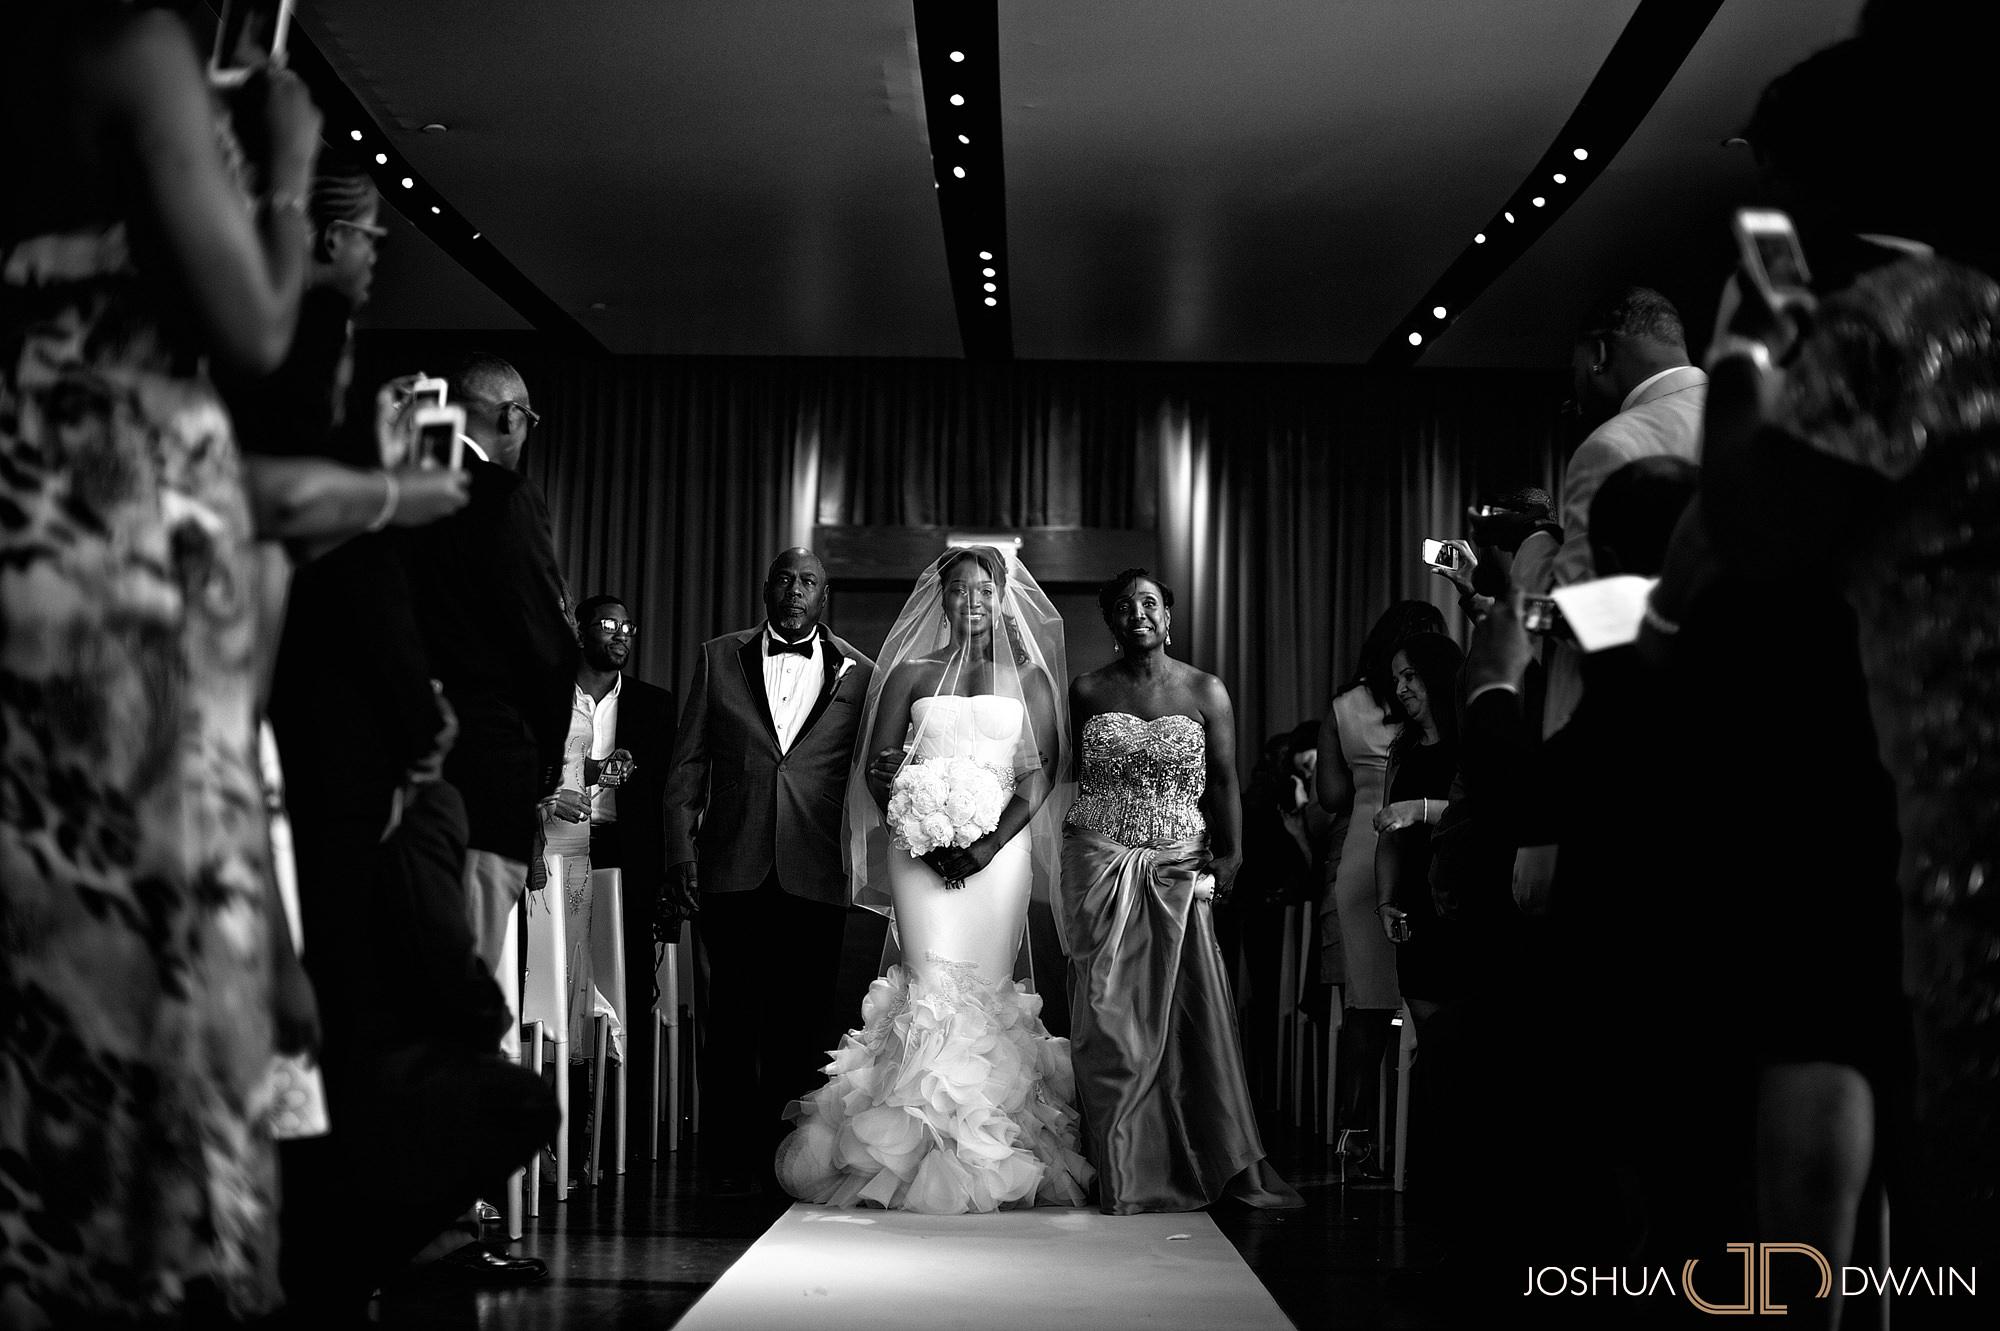 joshua-dwain-weddings-gallery-best-wedding-photographers-us-045